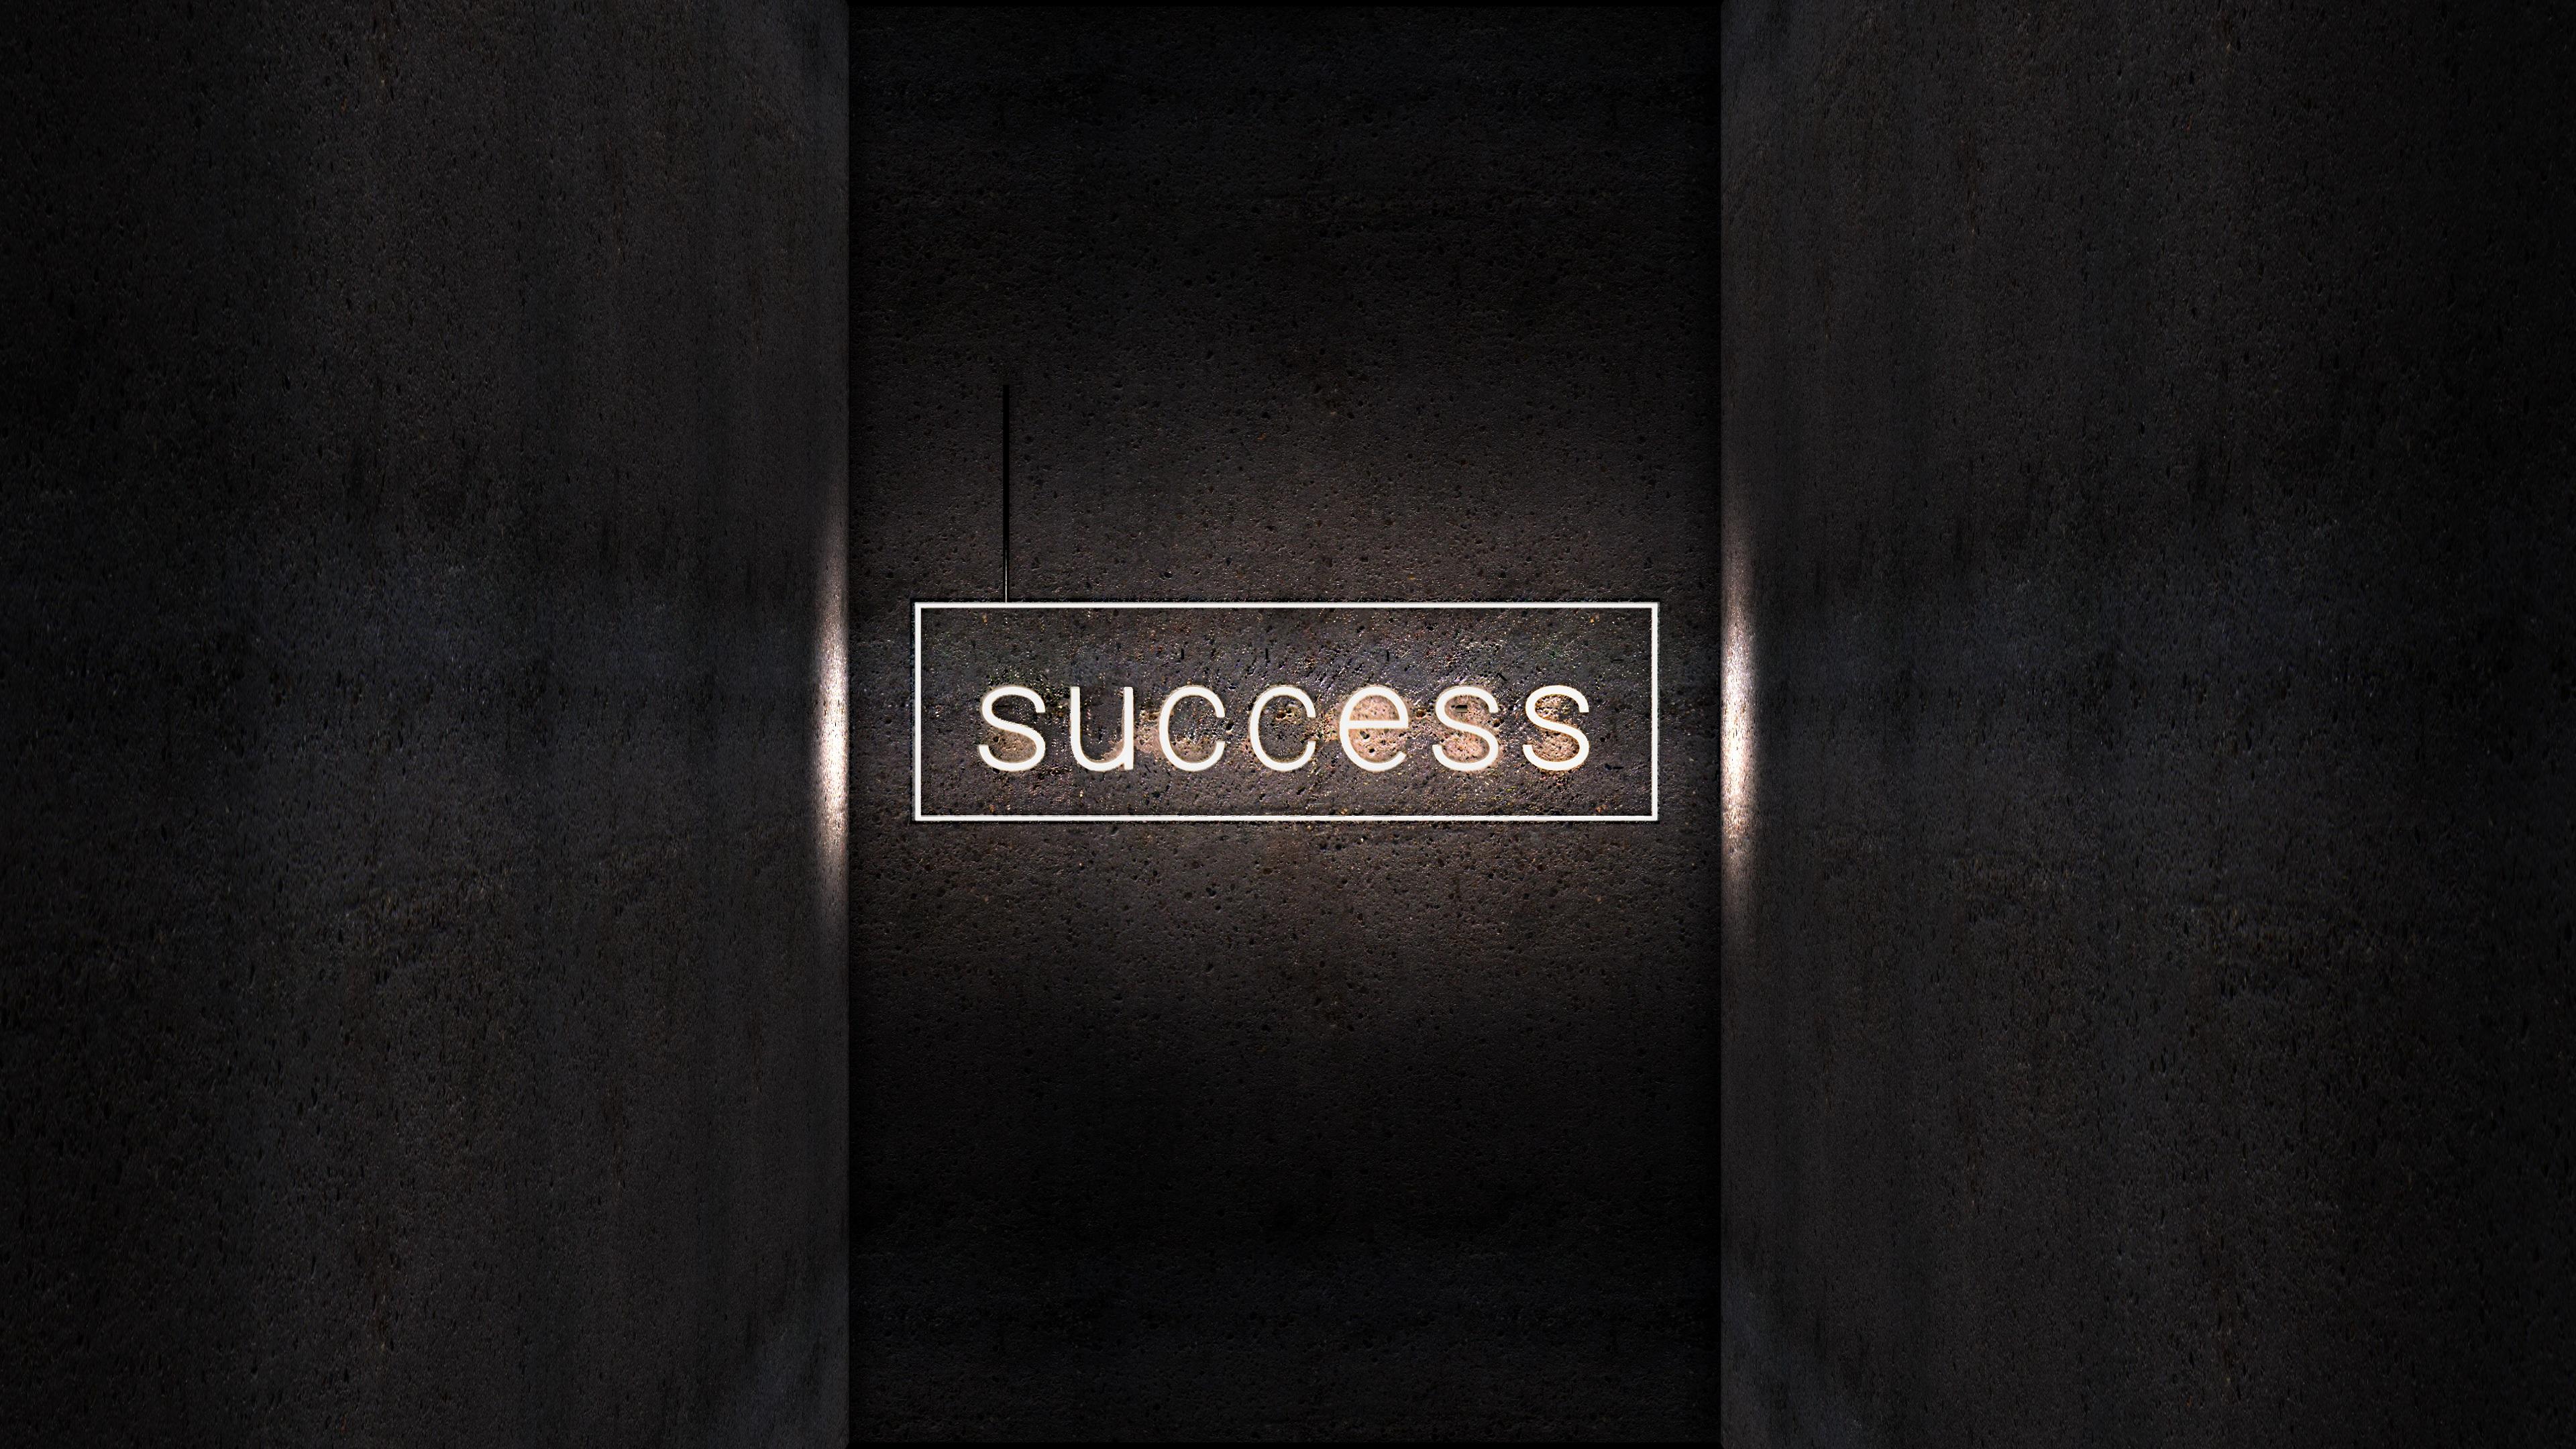 Wallpaper Inscription Light Neon Success 3840x2160